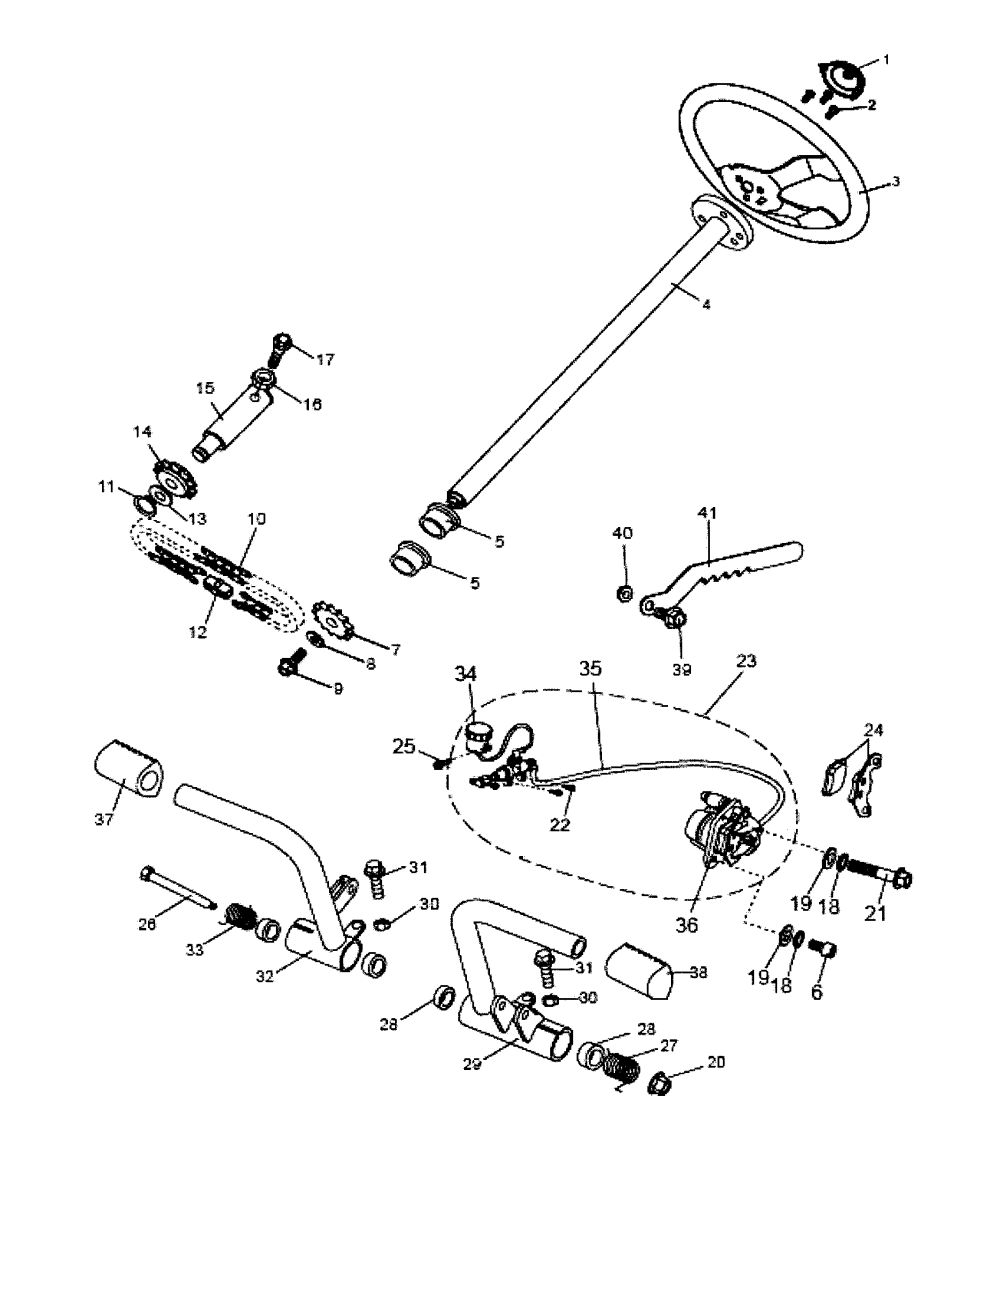 medium resolution of manco model 6150 gokarts minibikes genuine parts go kart throttle cable diagram manco go kart parts diagram